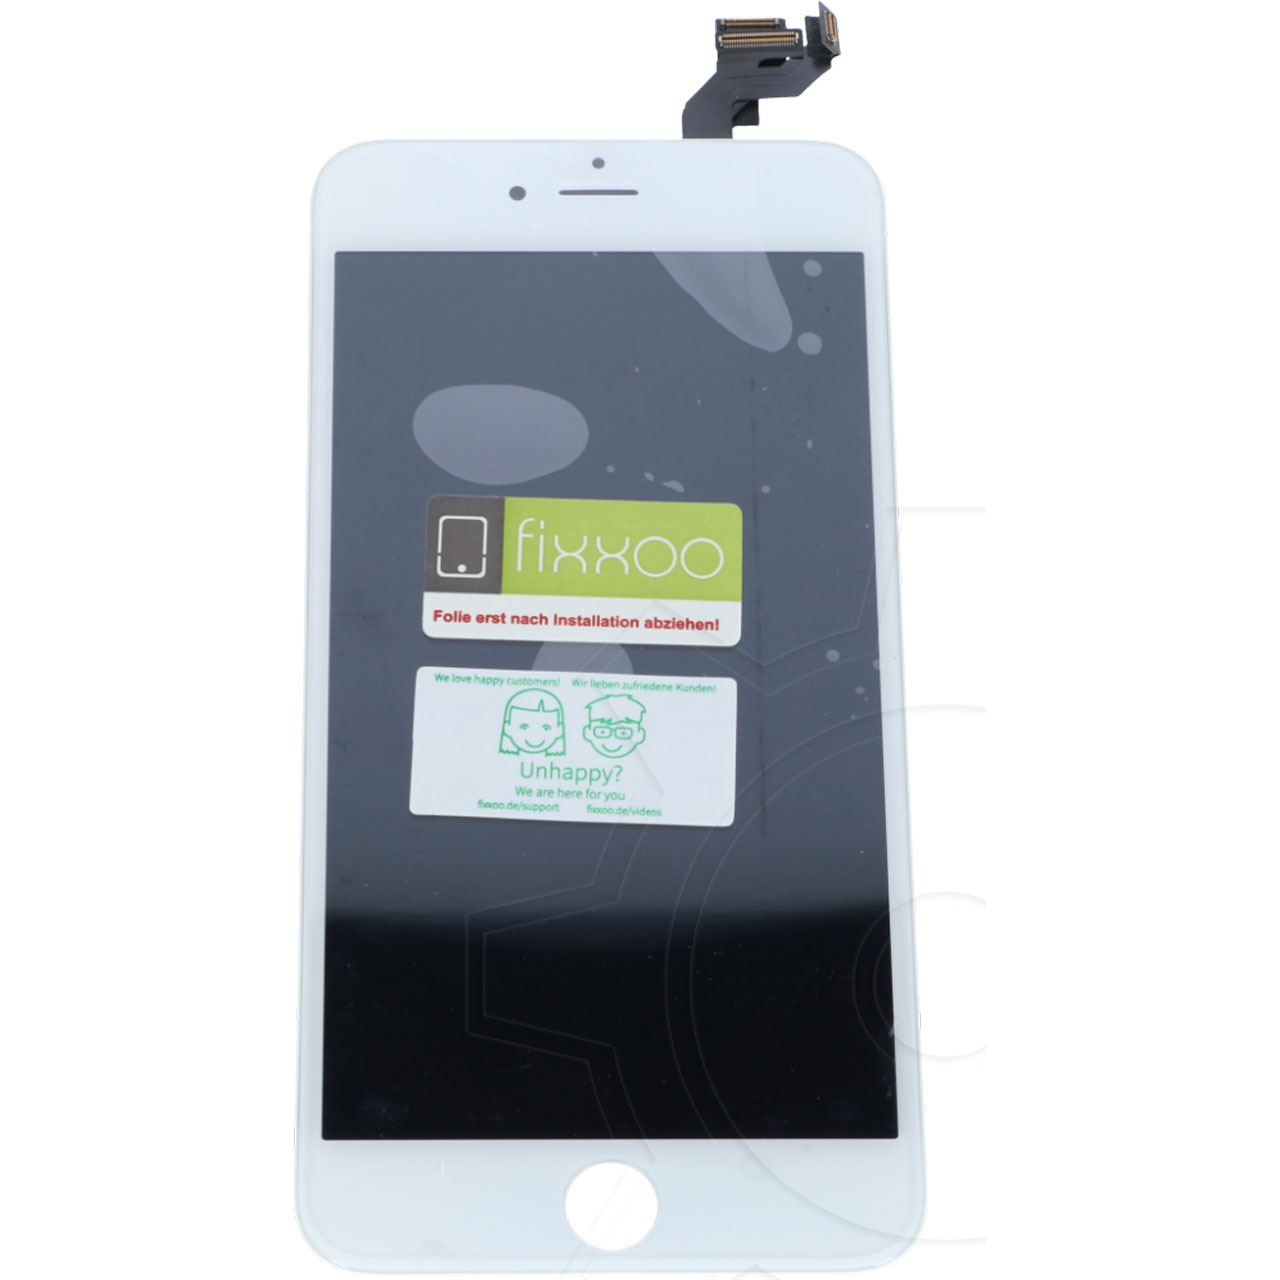 Giga Fixxoo Iphone S Display